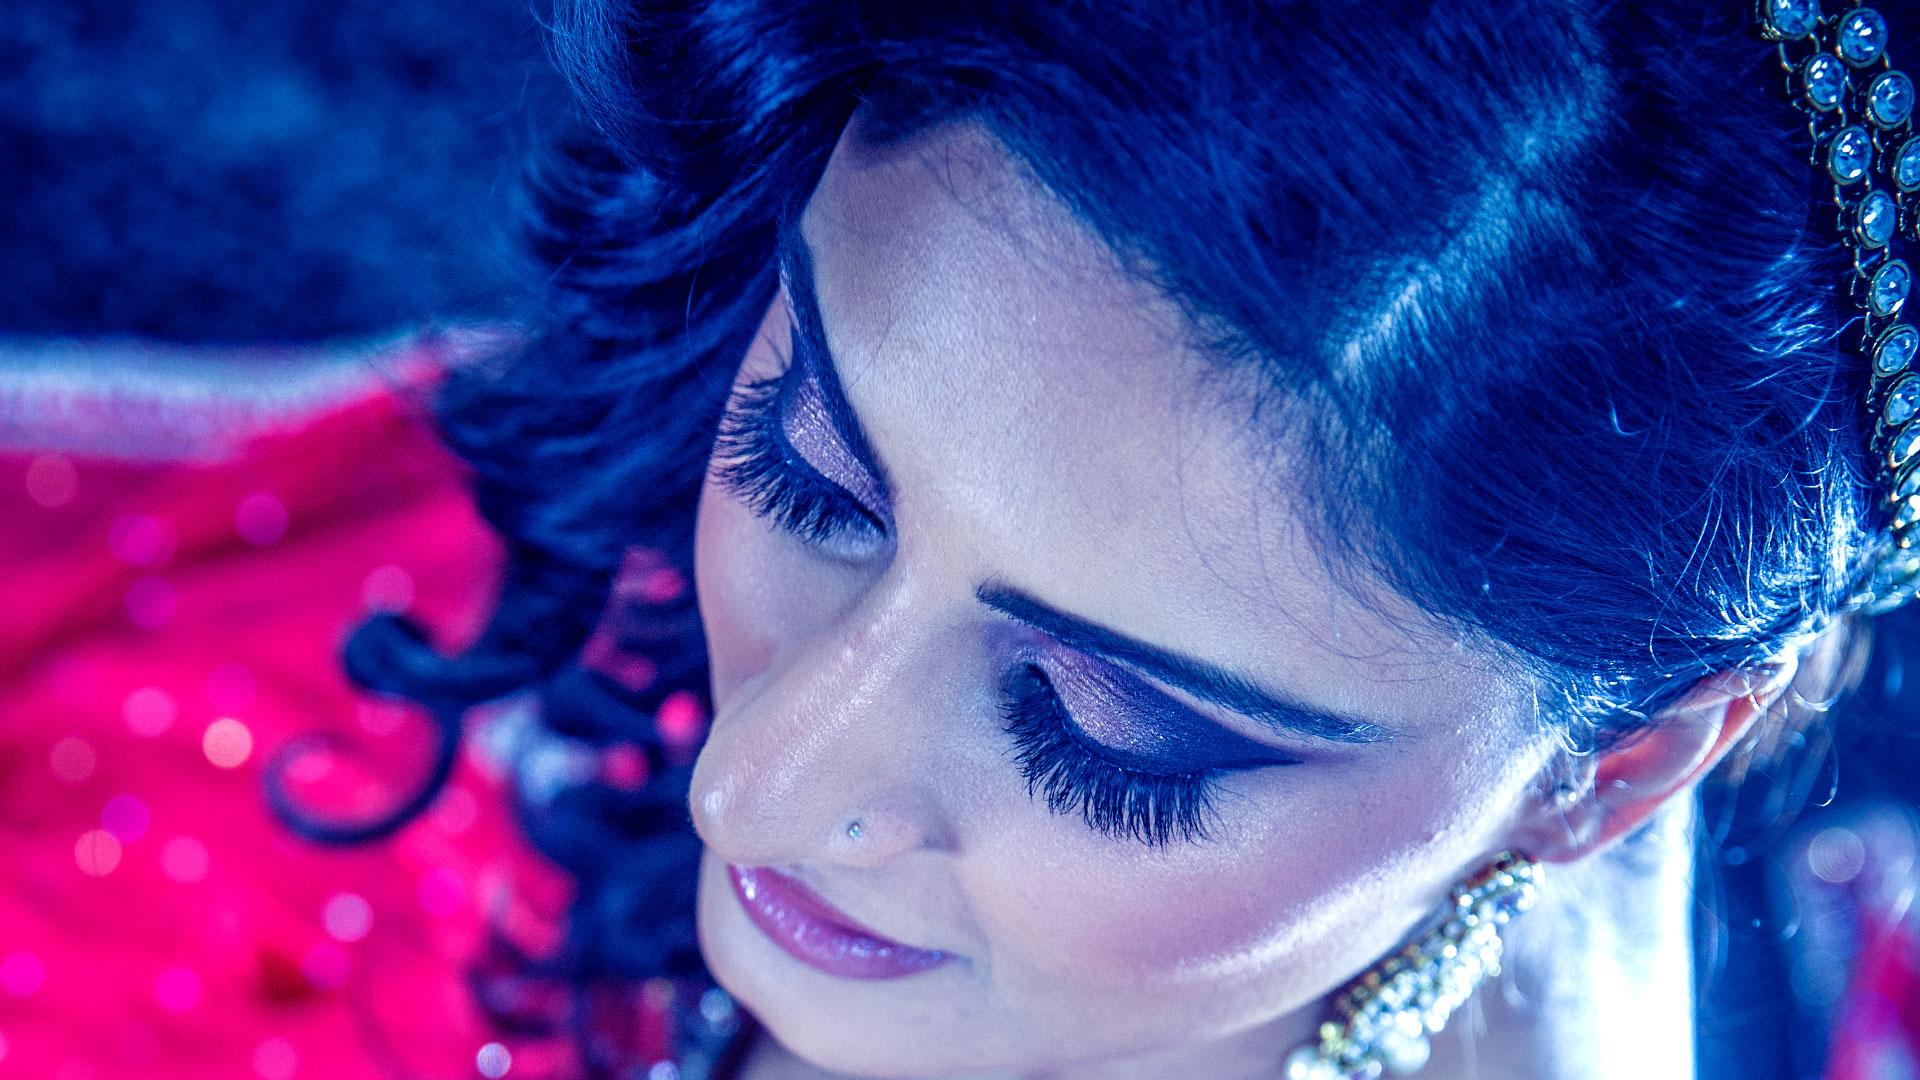 epic_sky_pictures_eyes_wedding_photography_closeup_photo_brampton_canada_engagement_shoot_eshoot